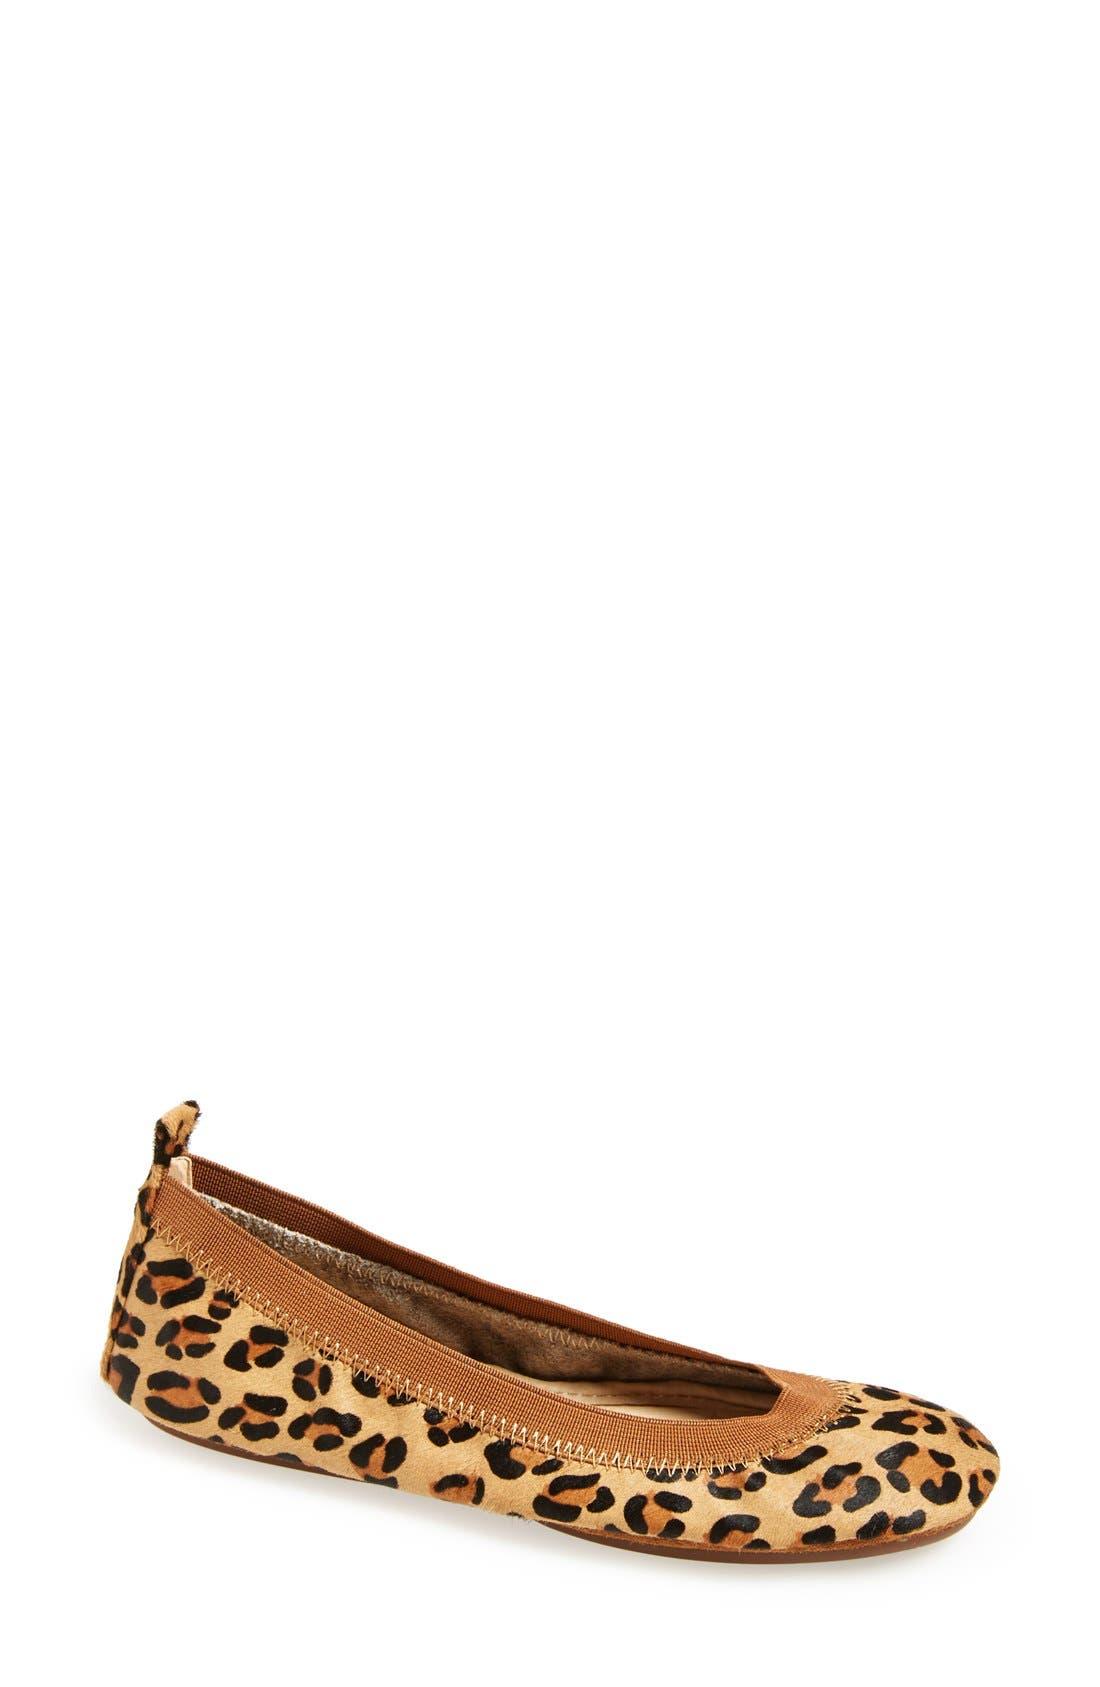 'Samara' Genuine Calf Hair Foldable Ballet Flat,                         Main,                         color, 201